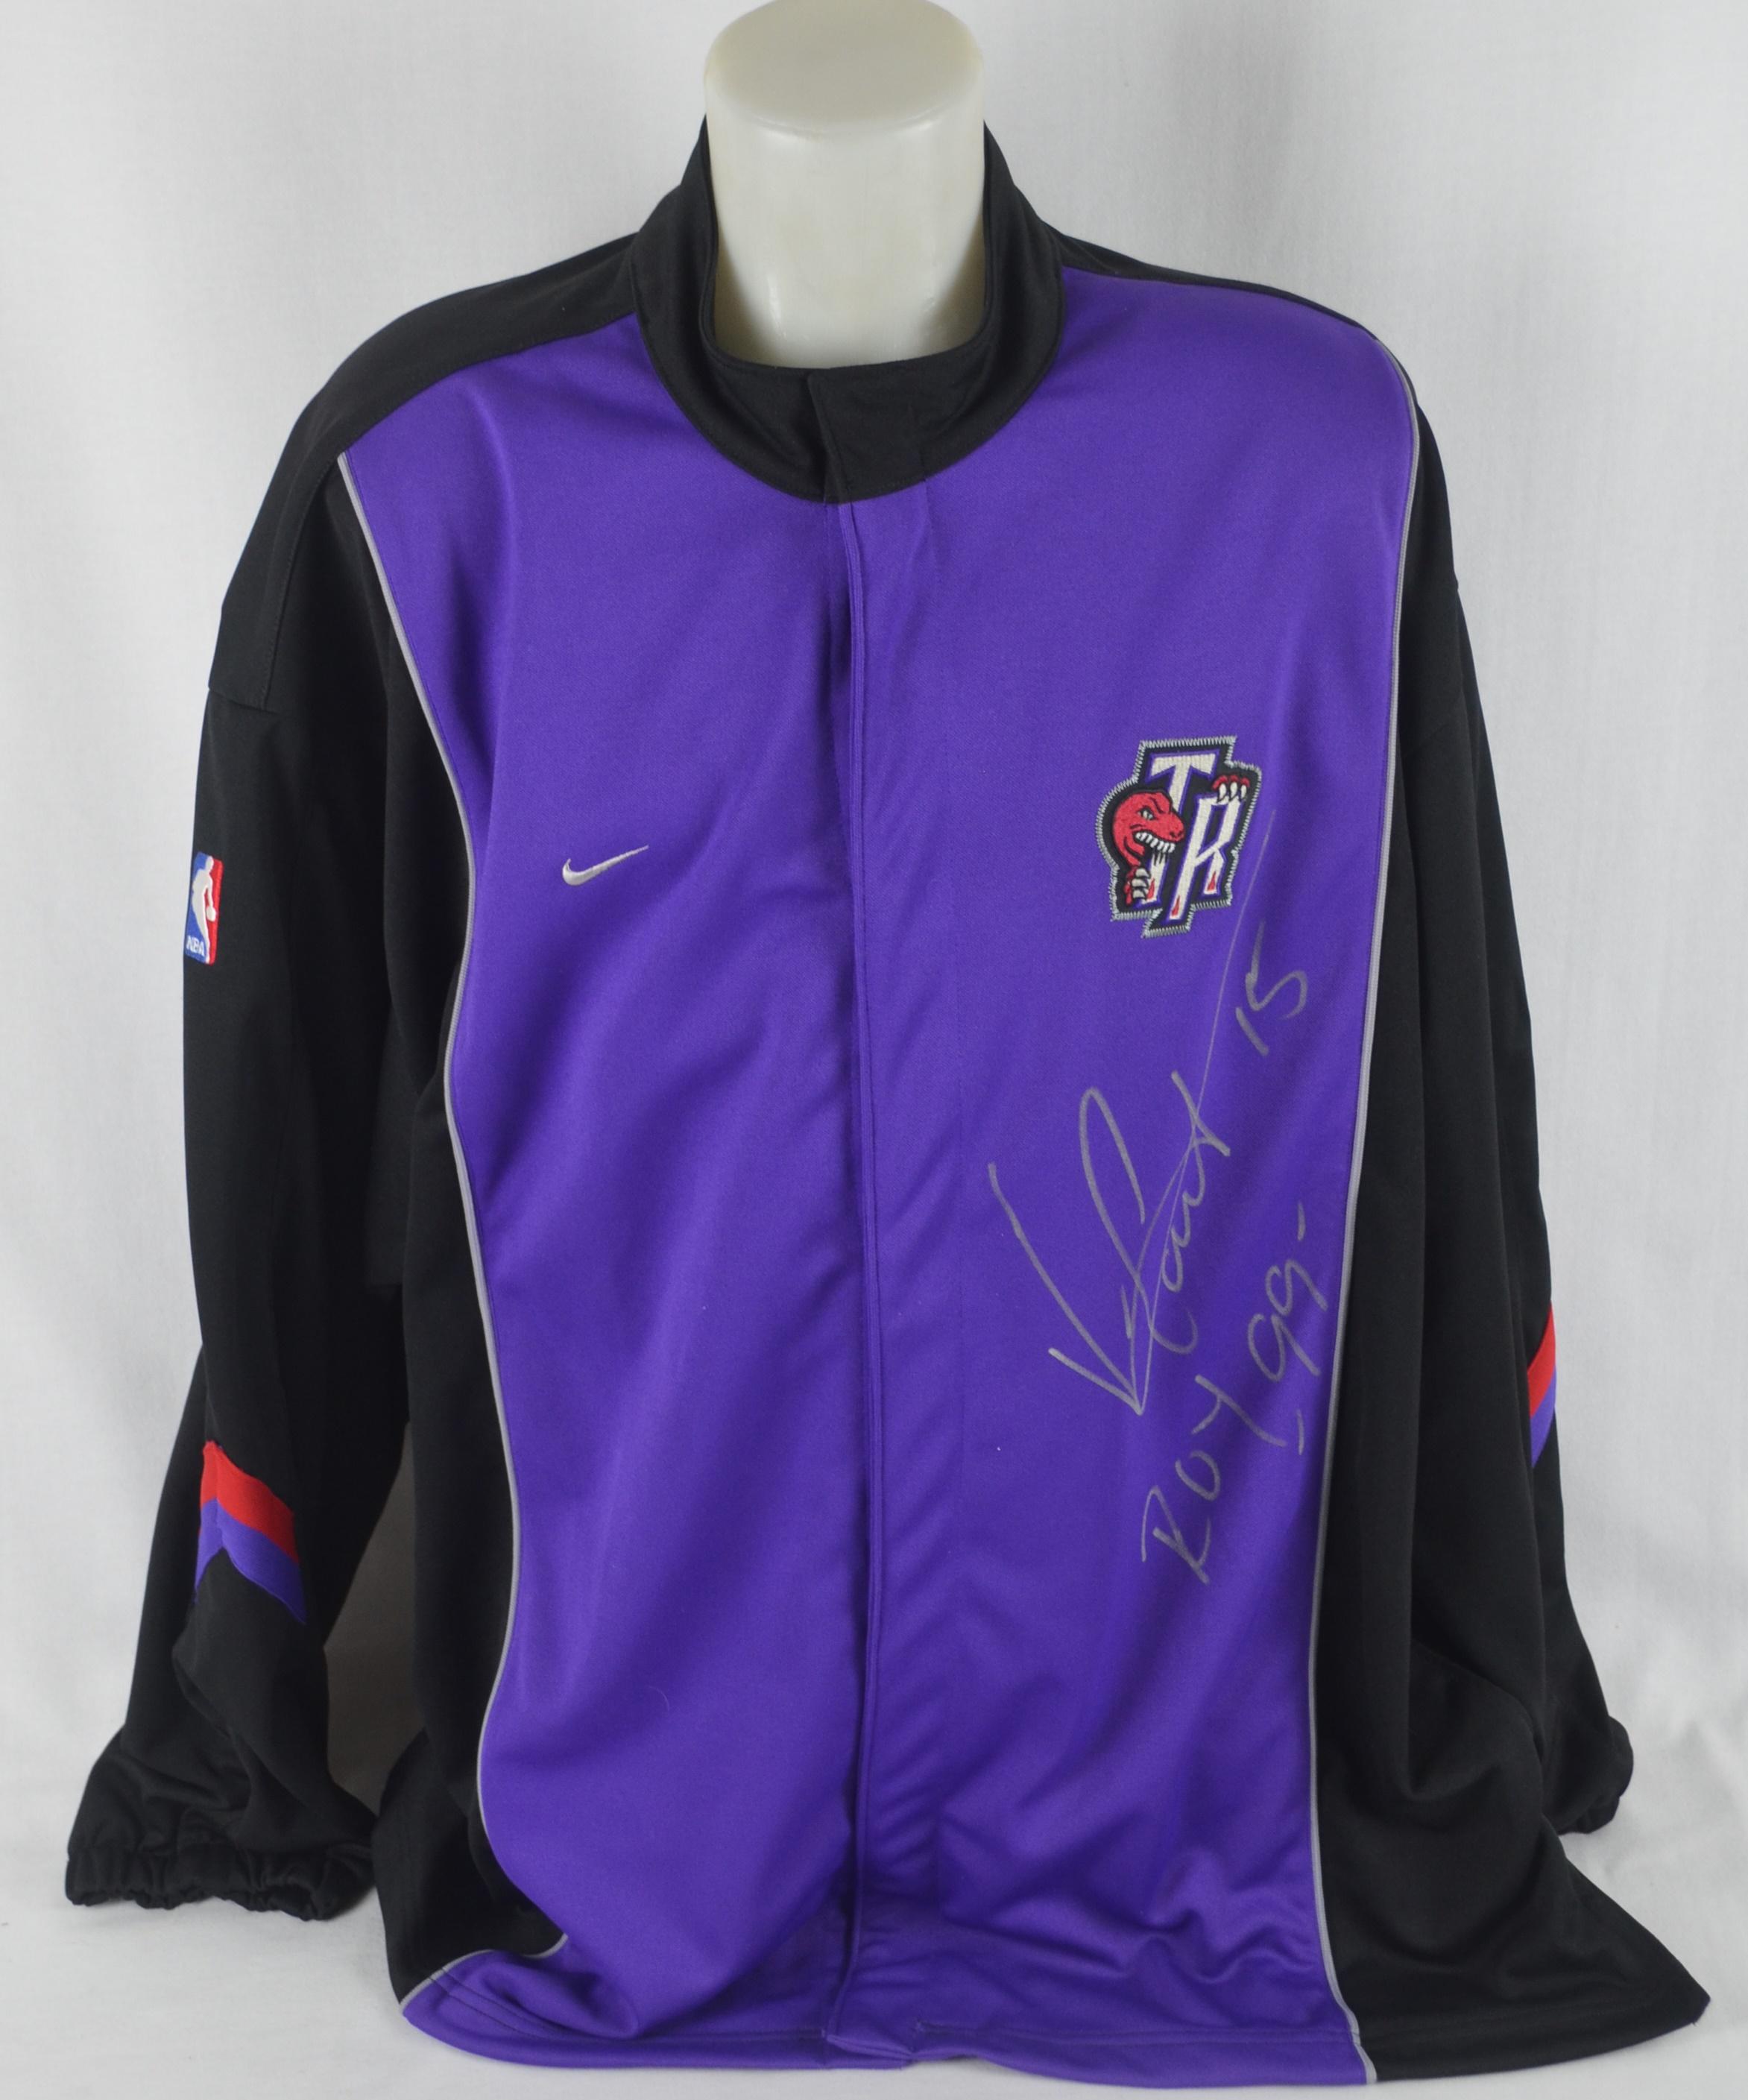 half off c2344 75570 Lot Detail - Vince Carter Autographed & Inscribed '99 ROY ...